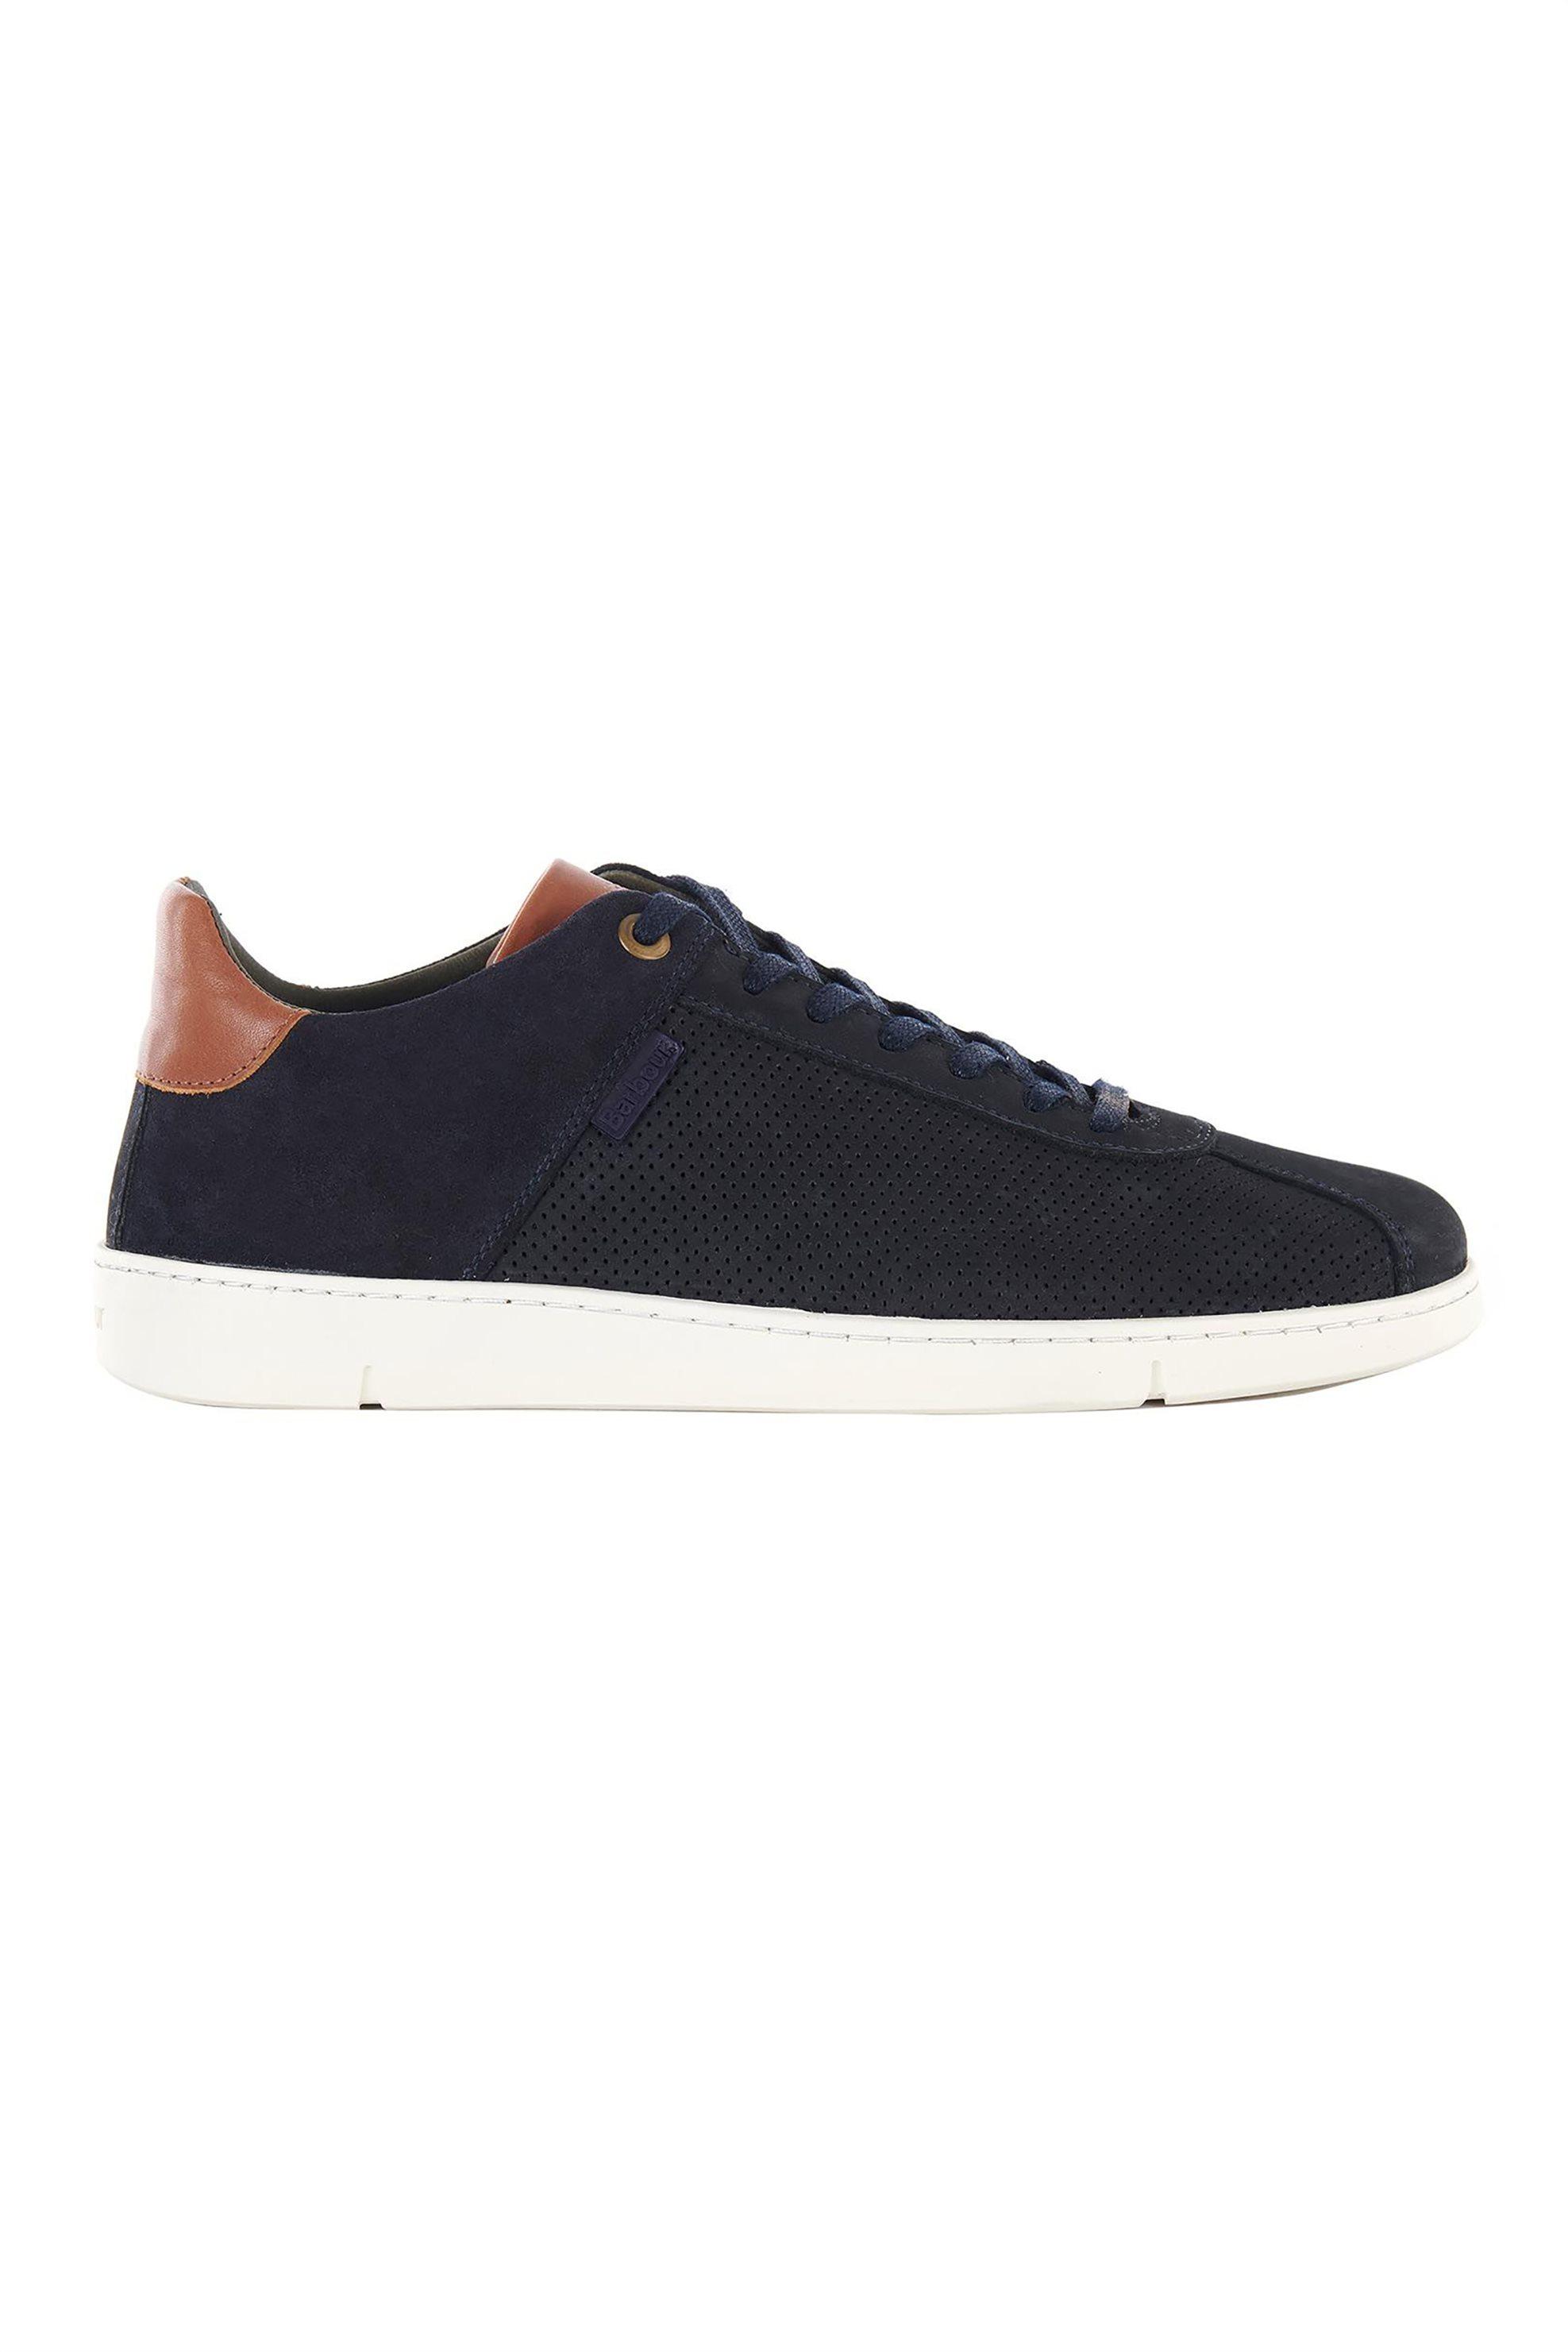 "Barbour ανδρικά δερμάτινα sneakers με suede επτομέρεια ""Bushtail"" – MFO0539 – Μπλε Σκούρο"